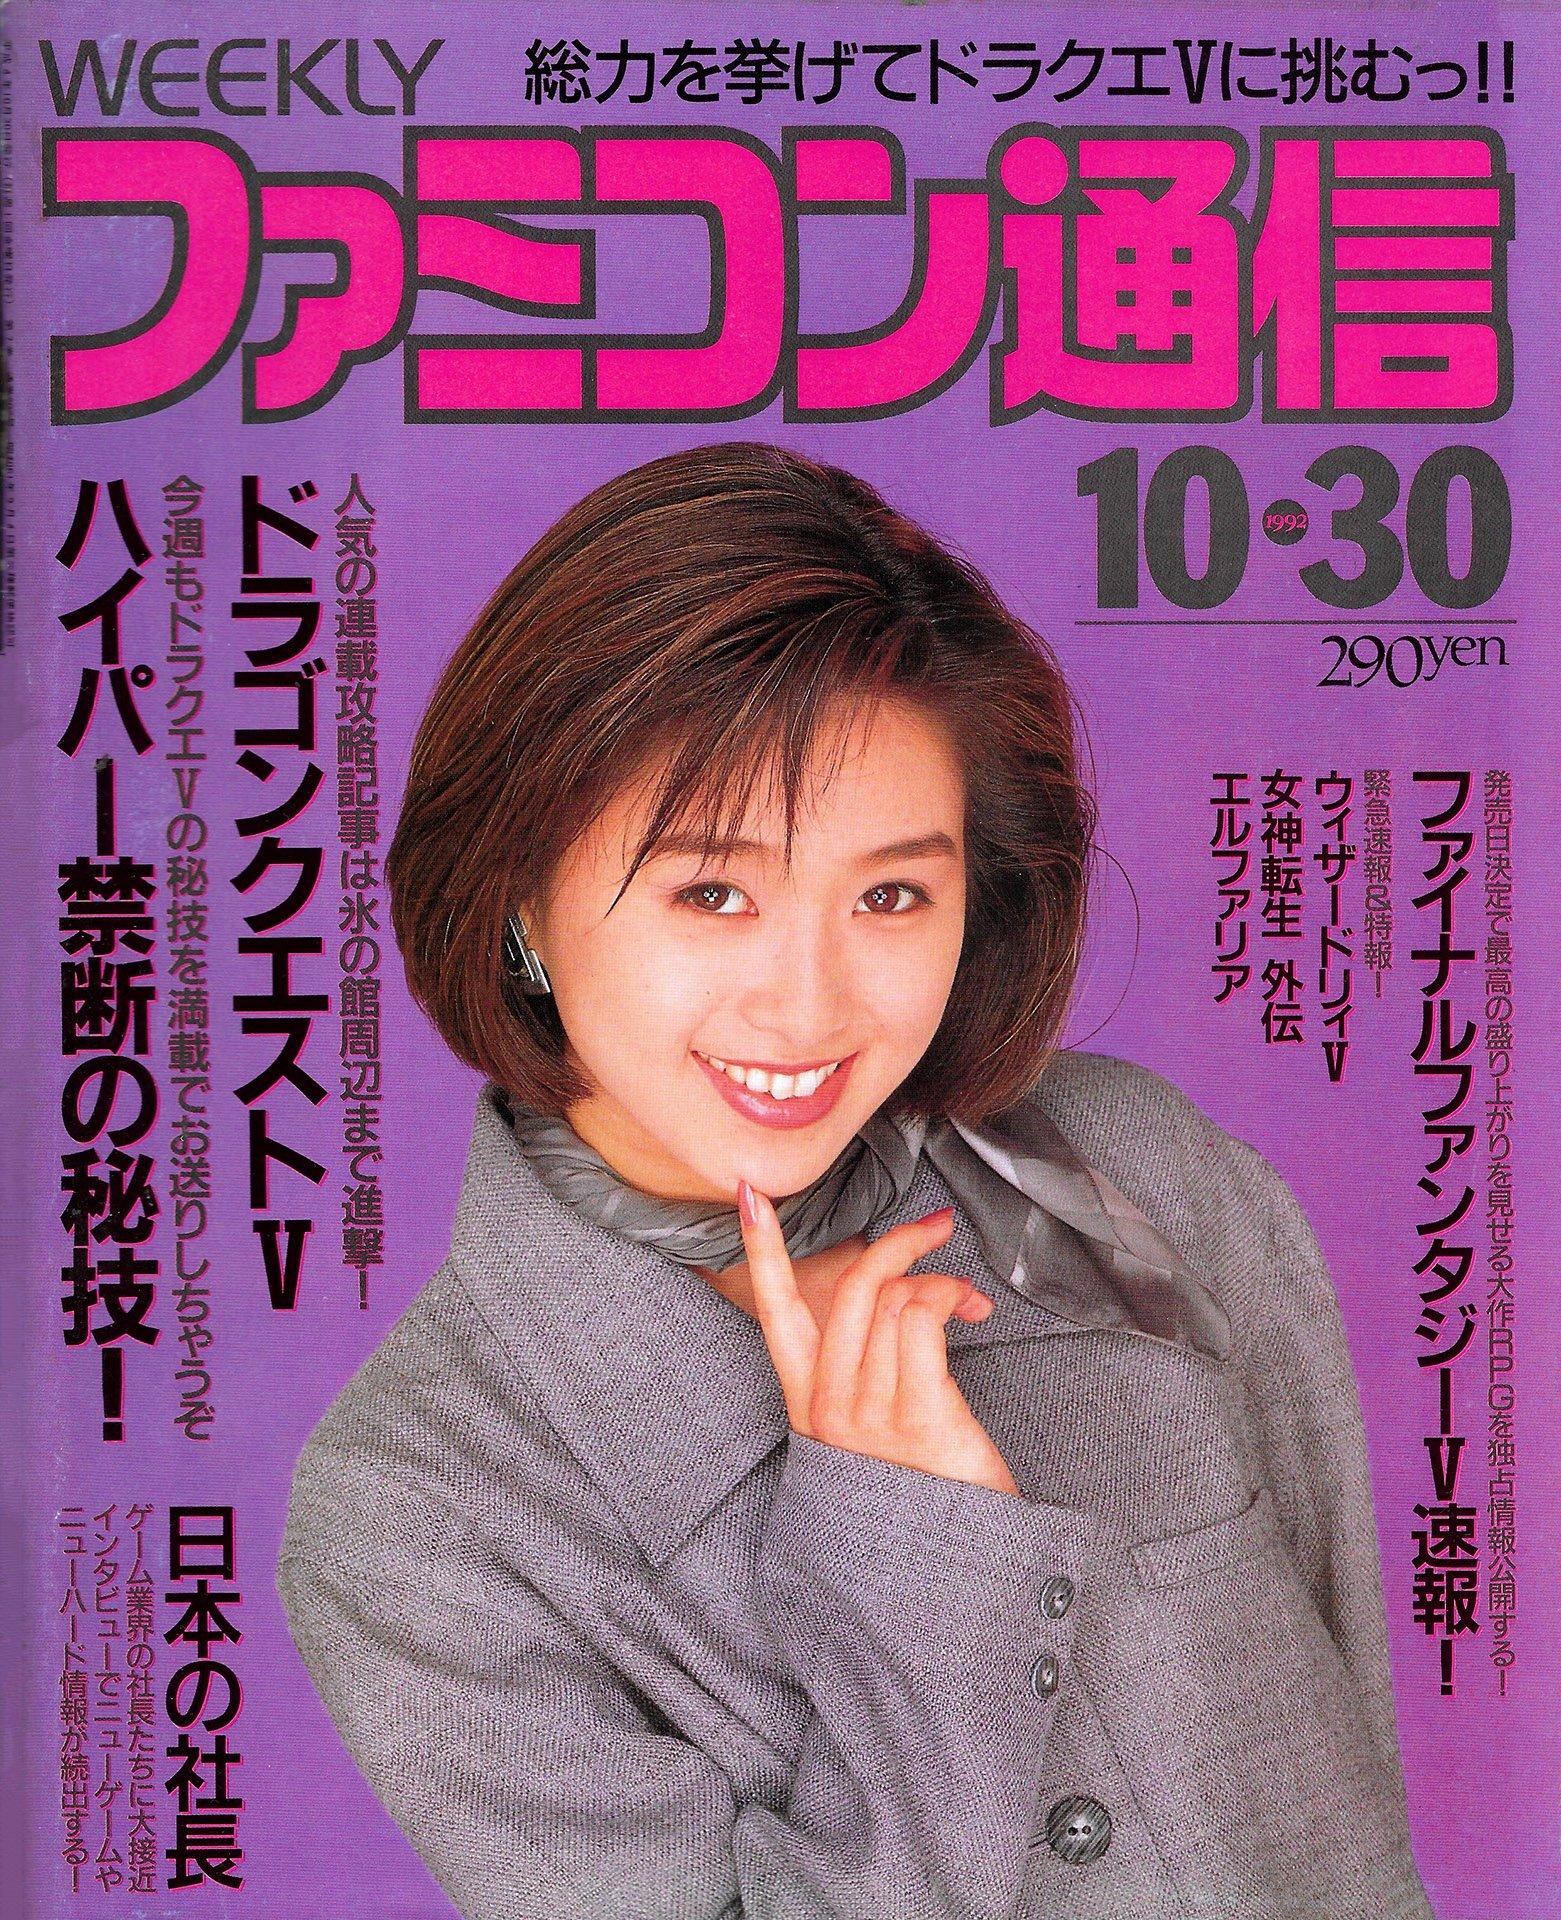 Famitsu 0202 (October 30, 1992)